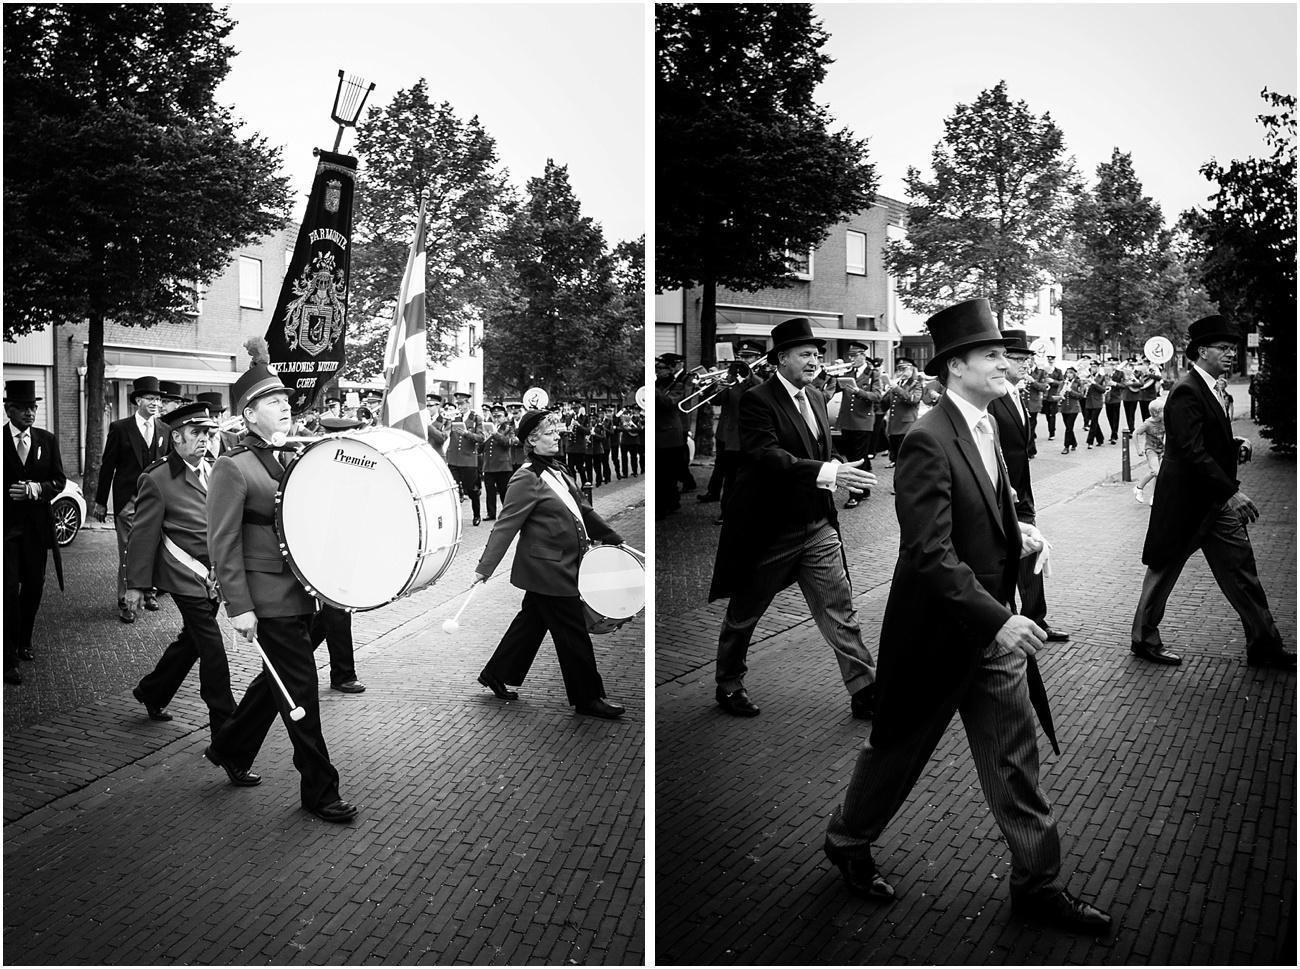 MichaelHabraken|photography_0851.jpg